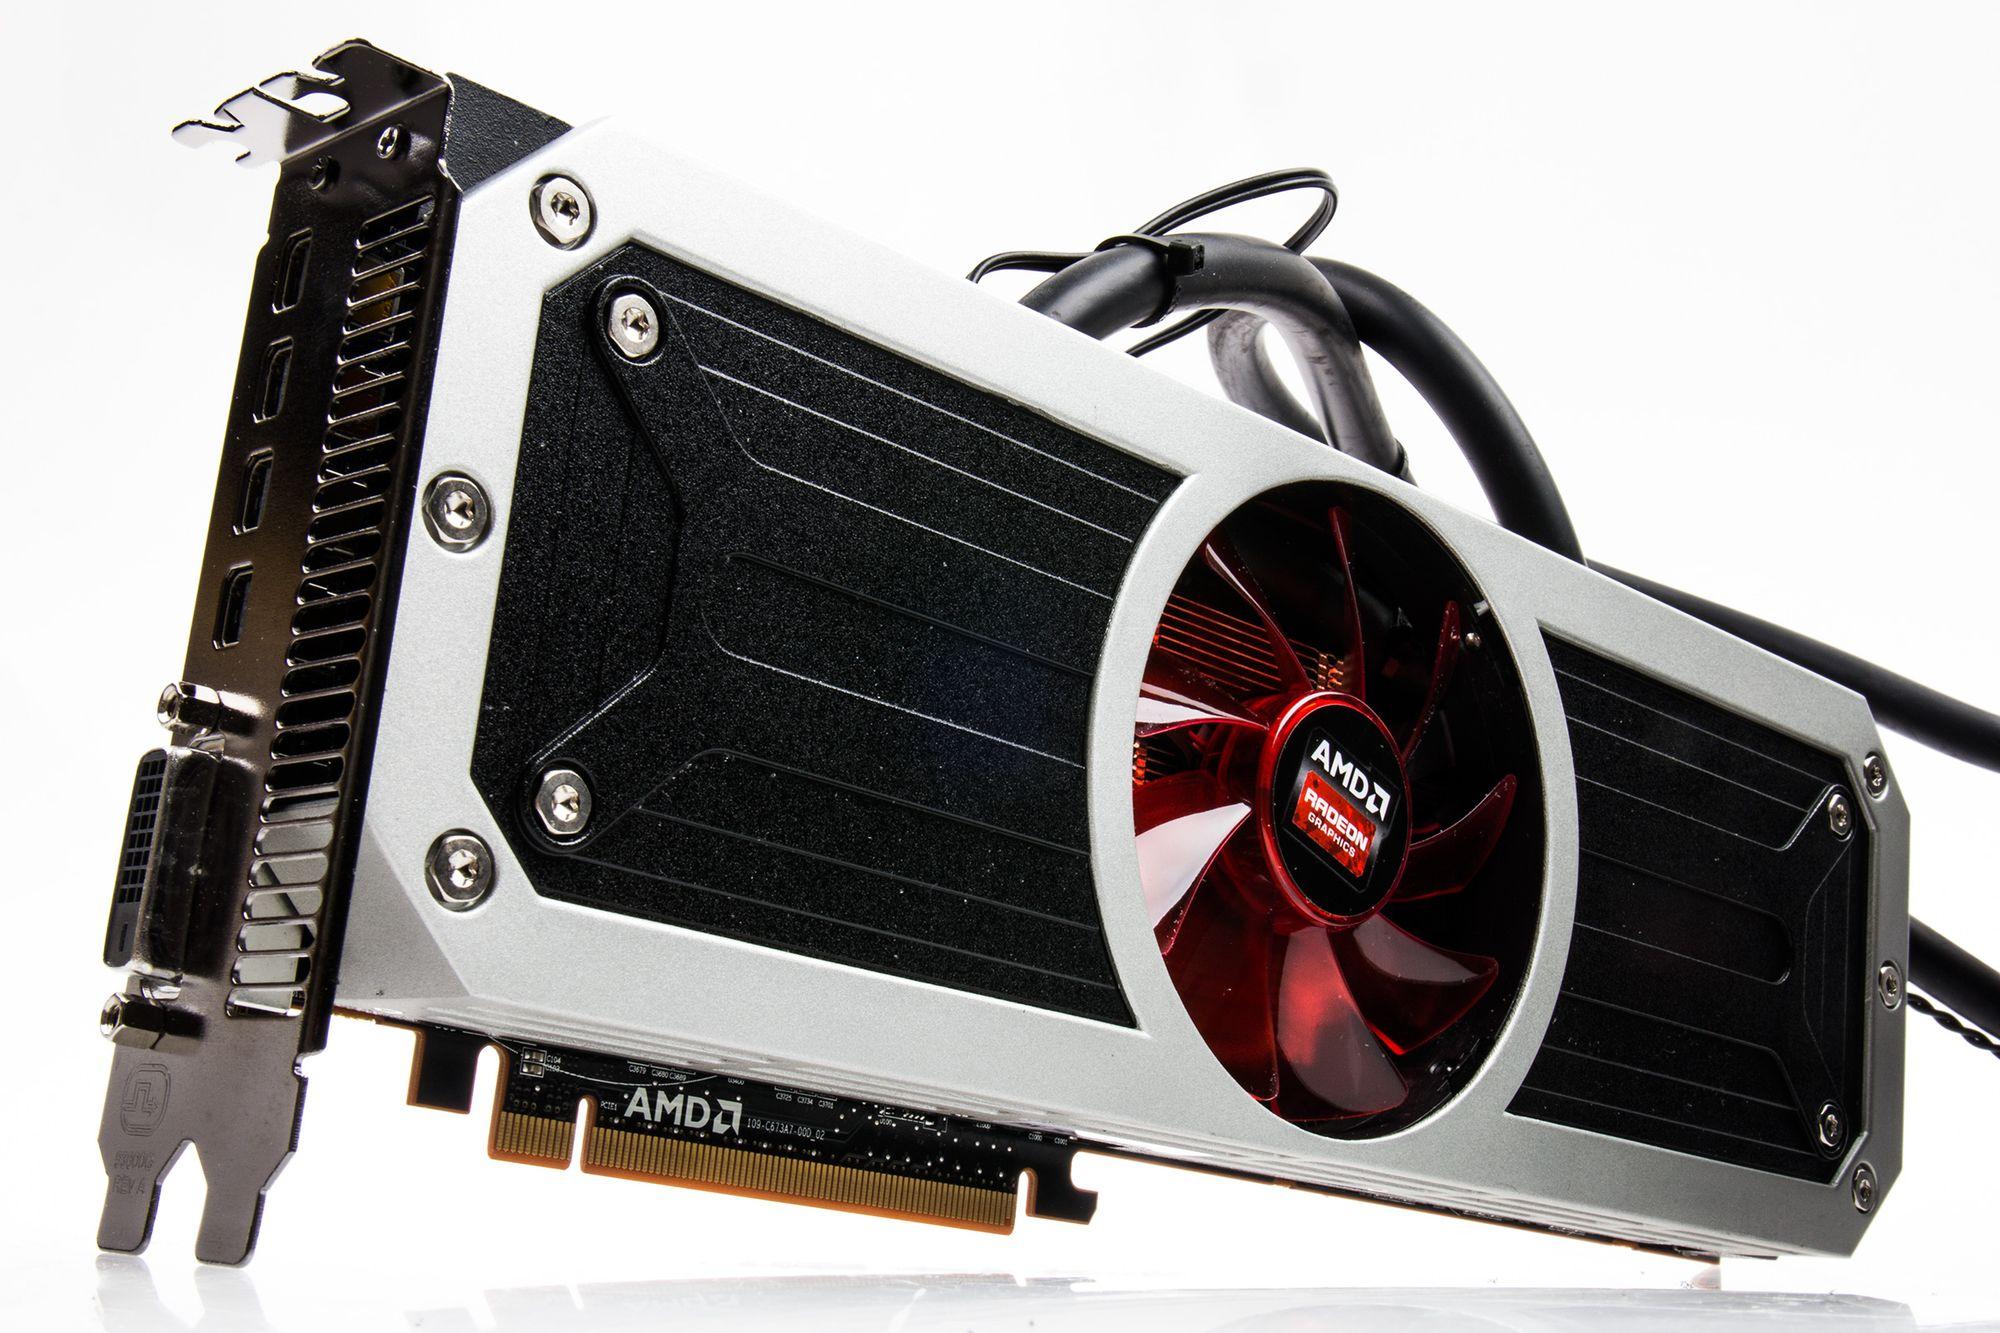 TEST: AMD Radeon R9 295X2 - Tek no